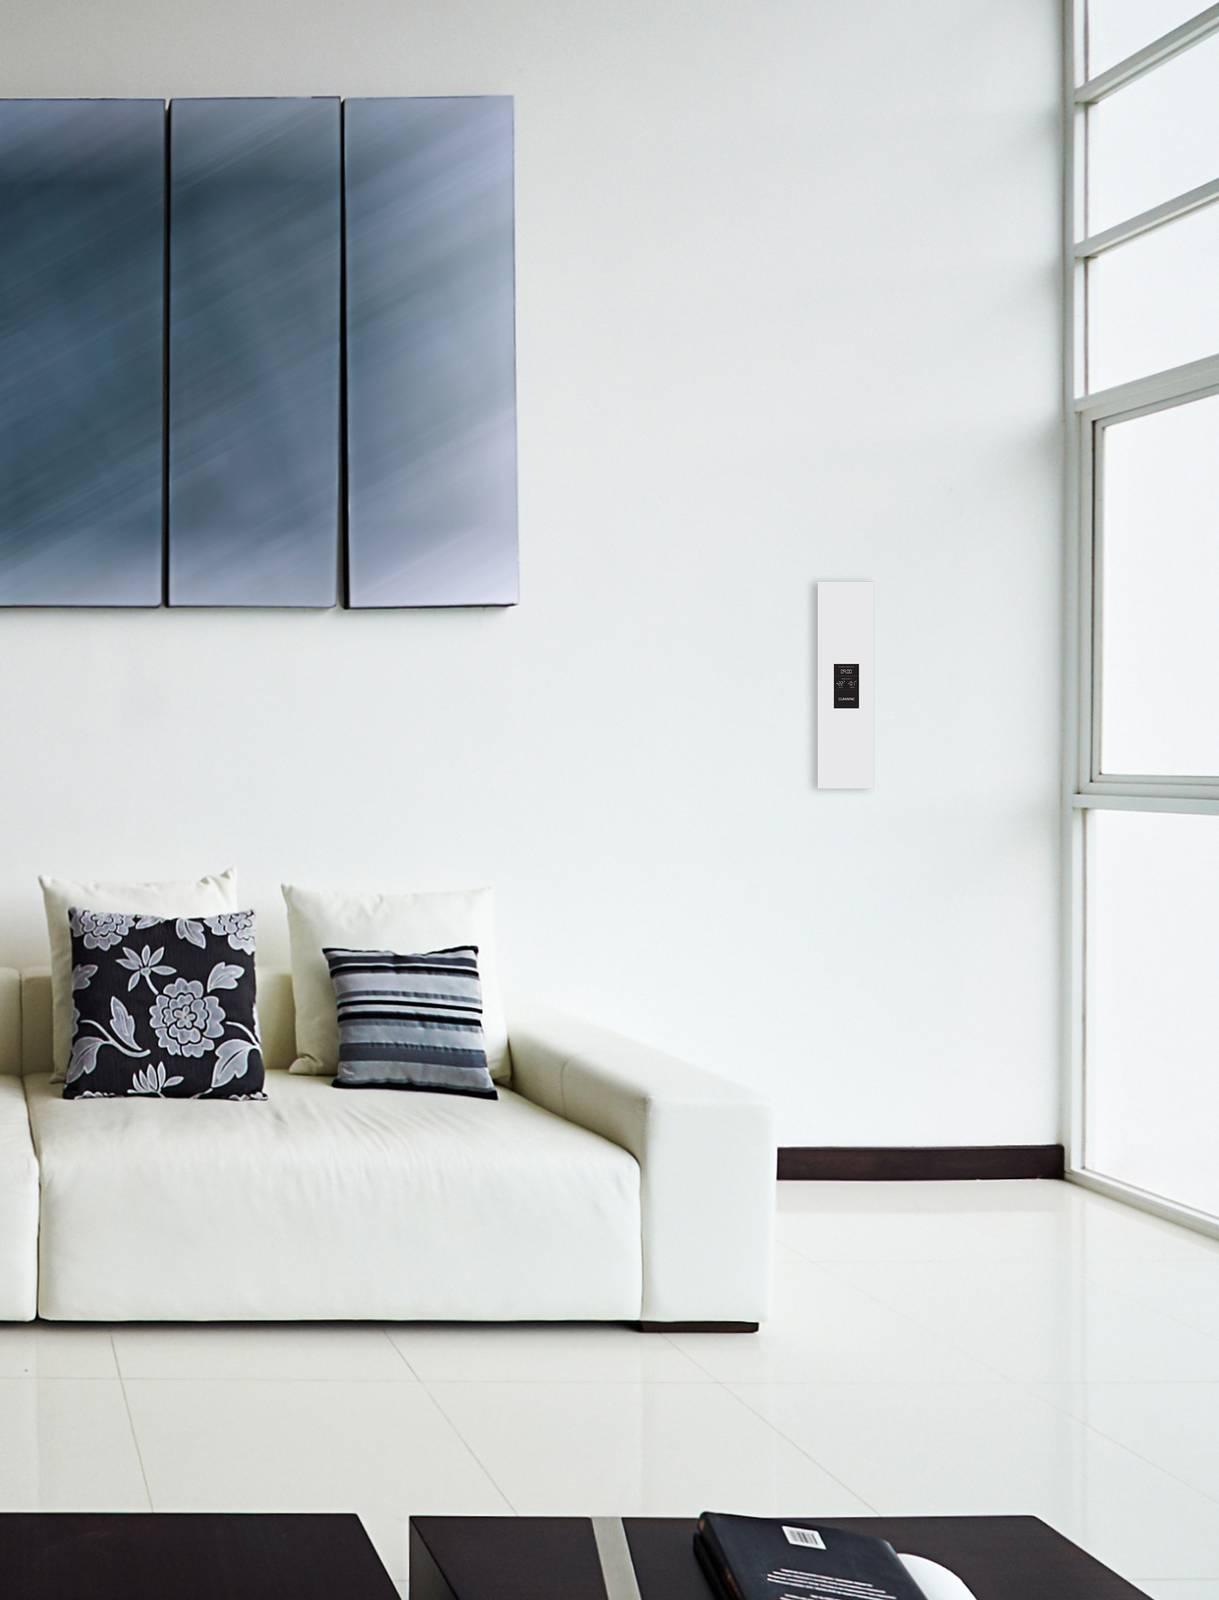 Aria pulita in casa grazie alla ventilazione meccanica - Ventilazione forzata casa ...